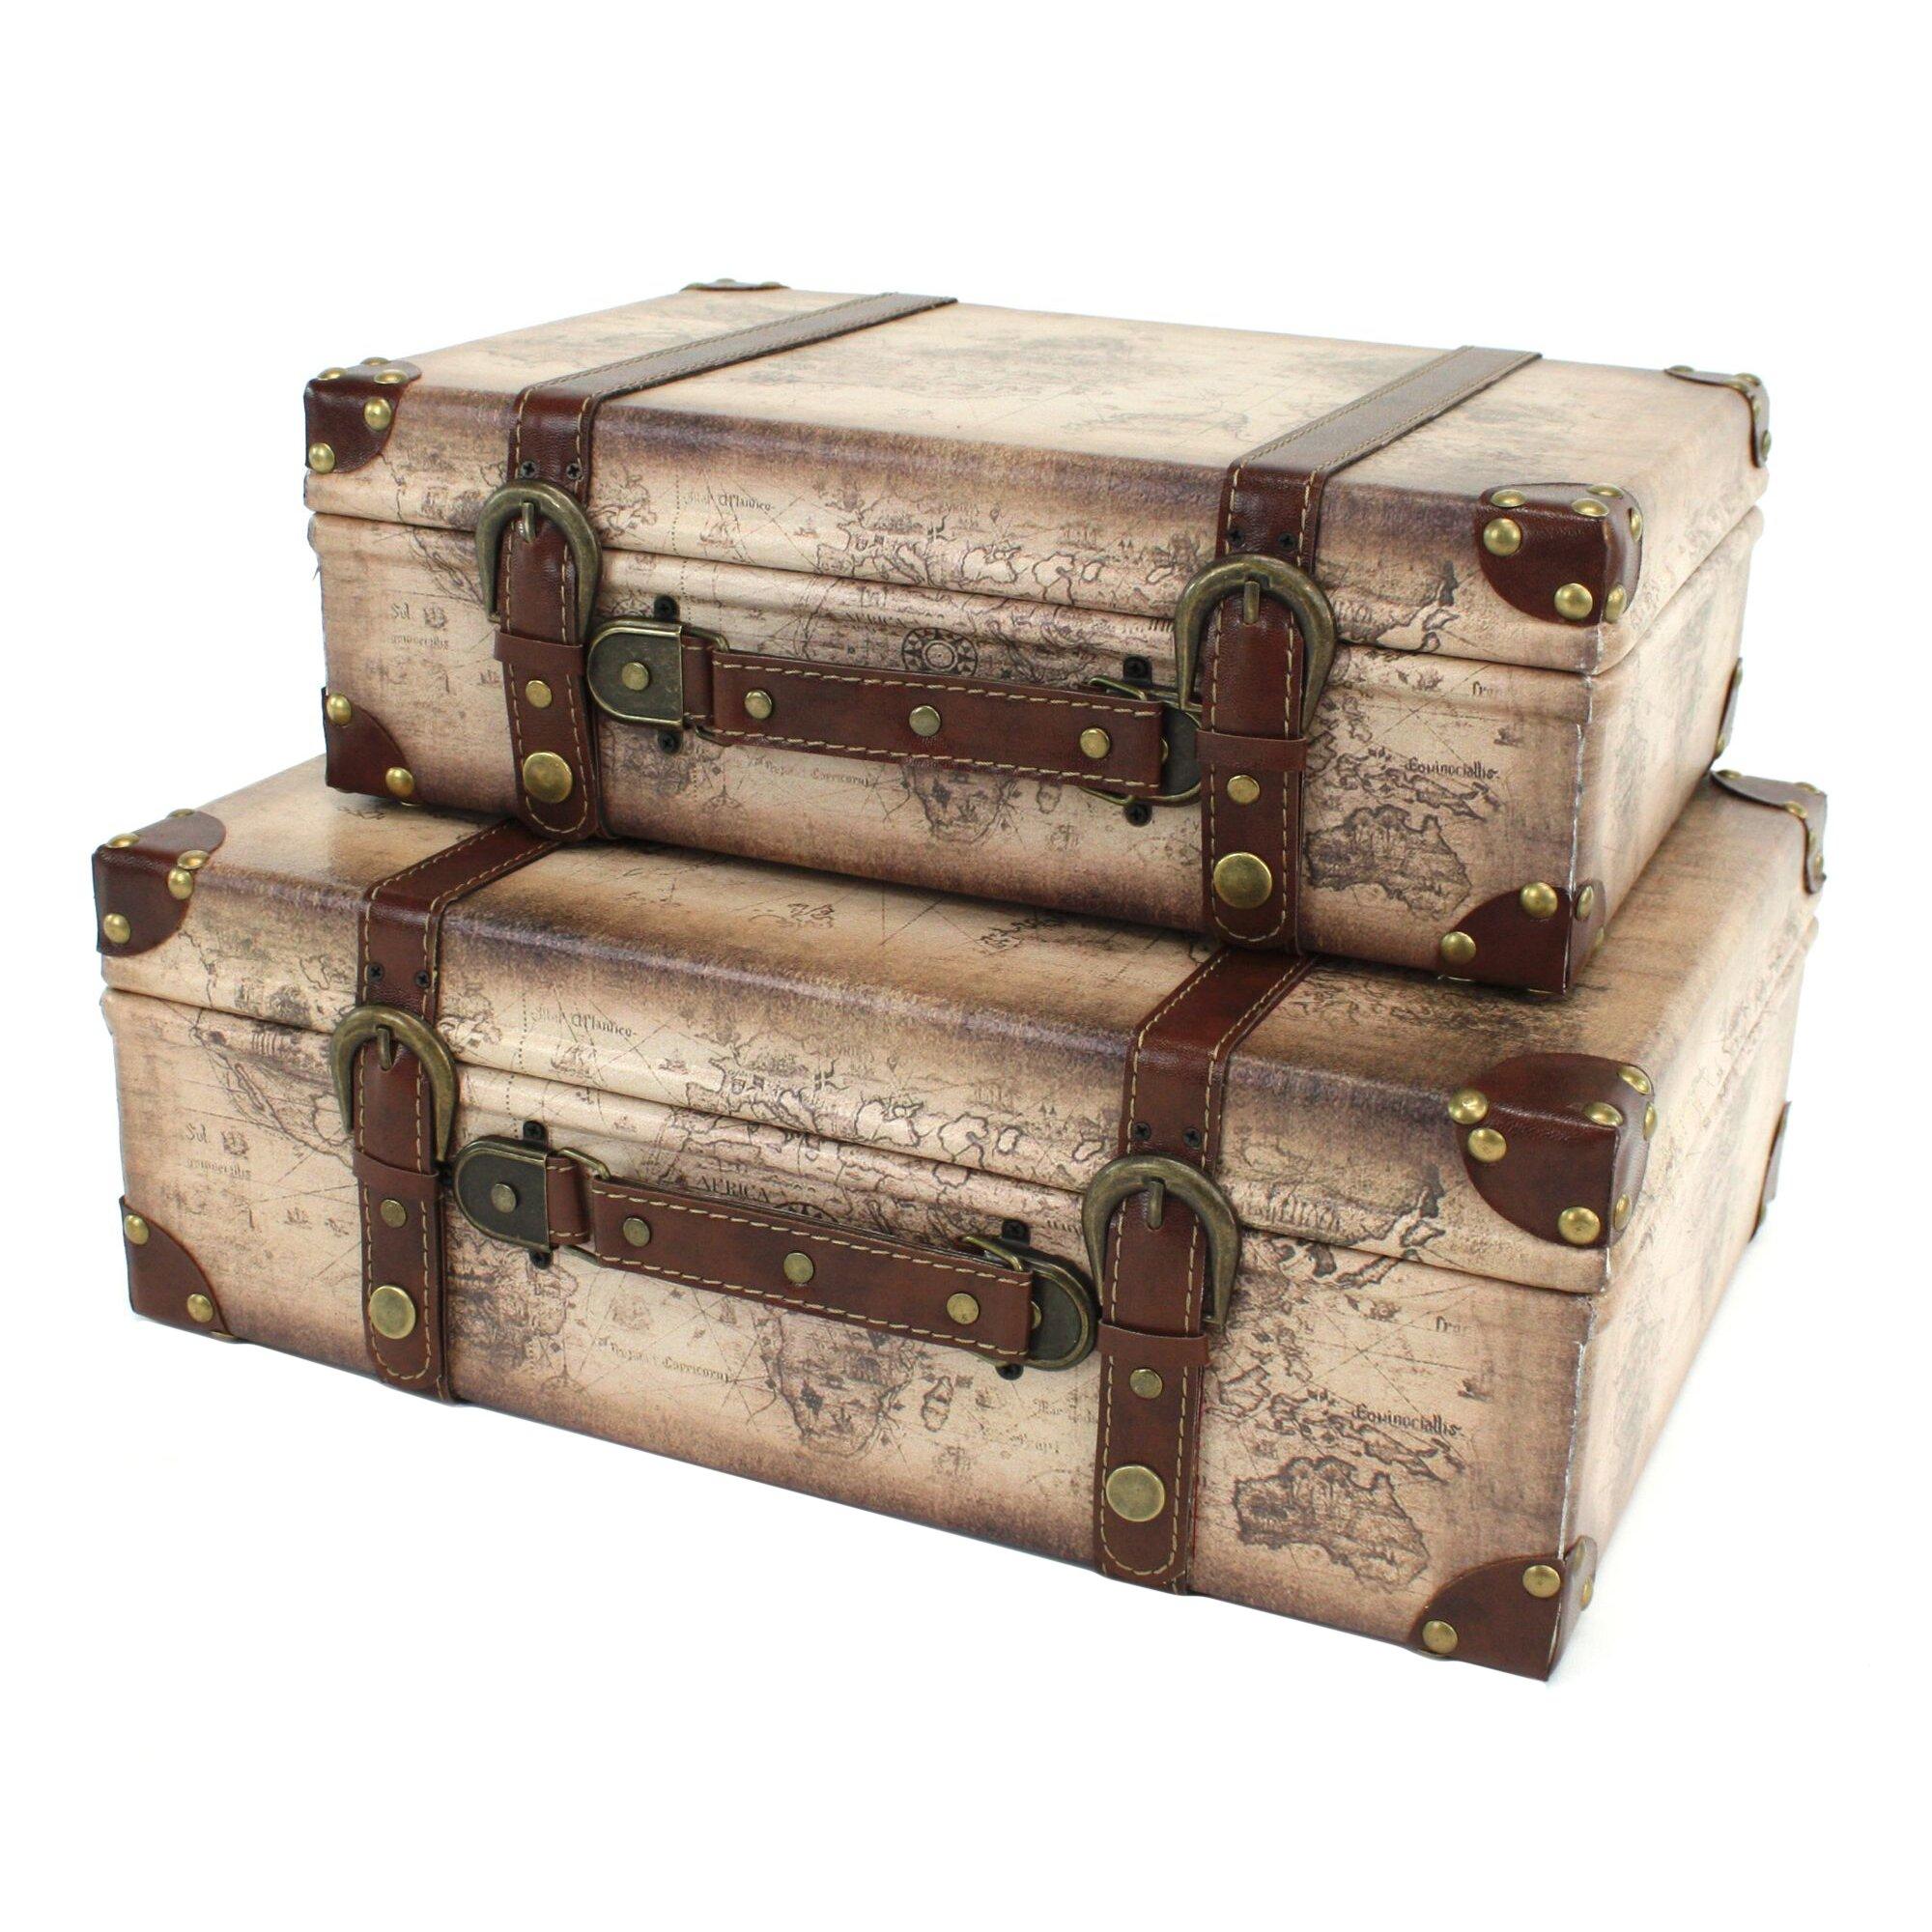 Suitcase Chair For Sale Aspire Windsor 2 Piece Suitcase Trunk Set & Reviews | Wayfair